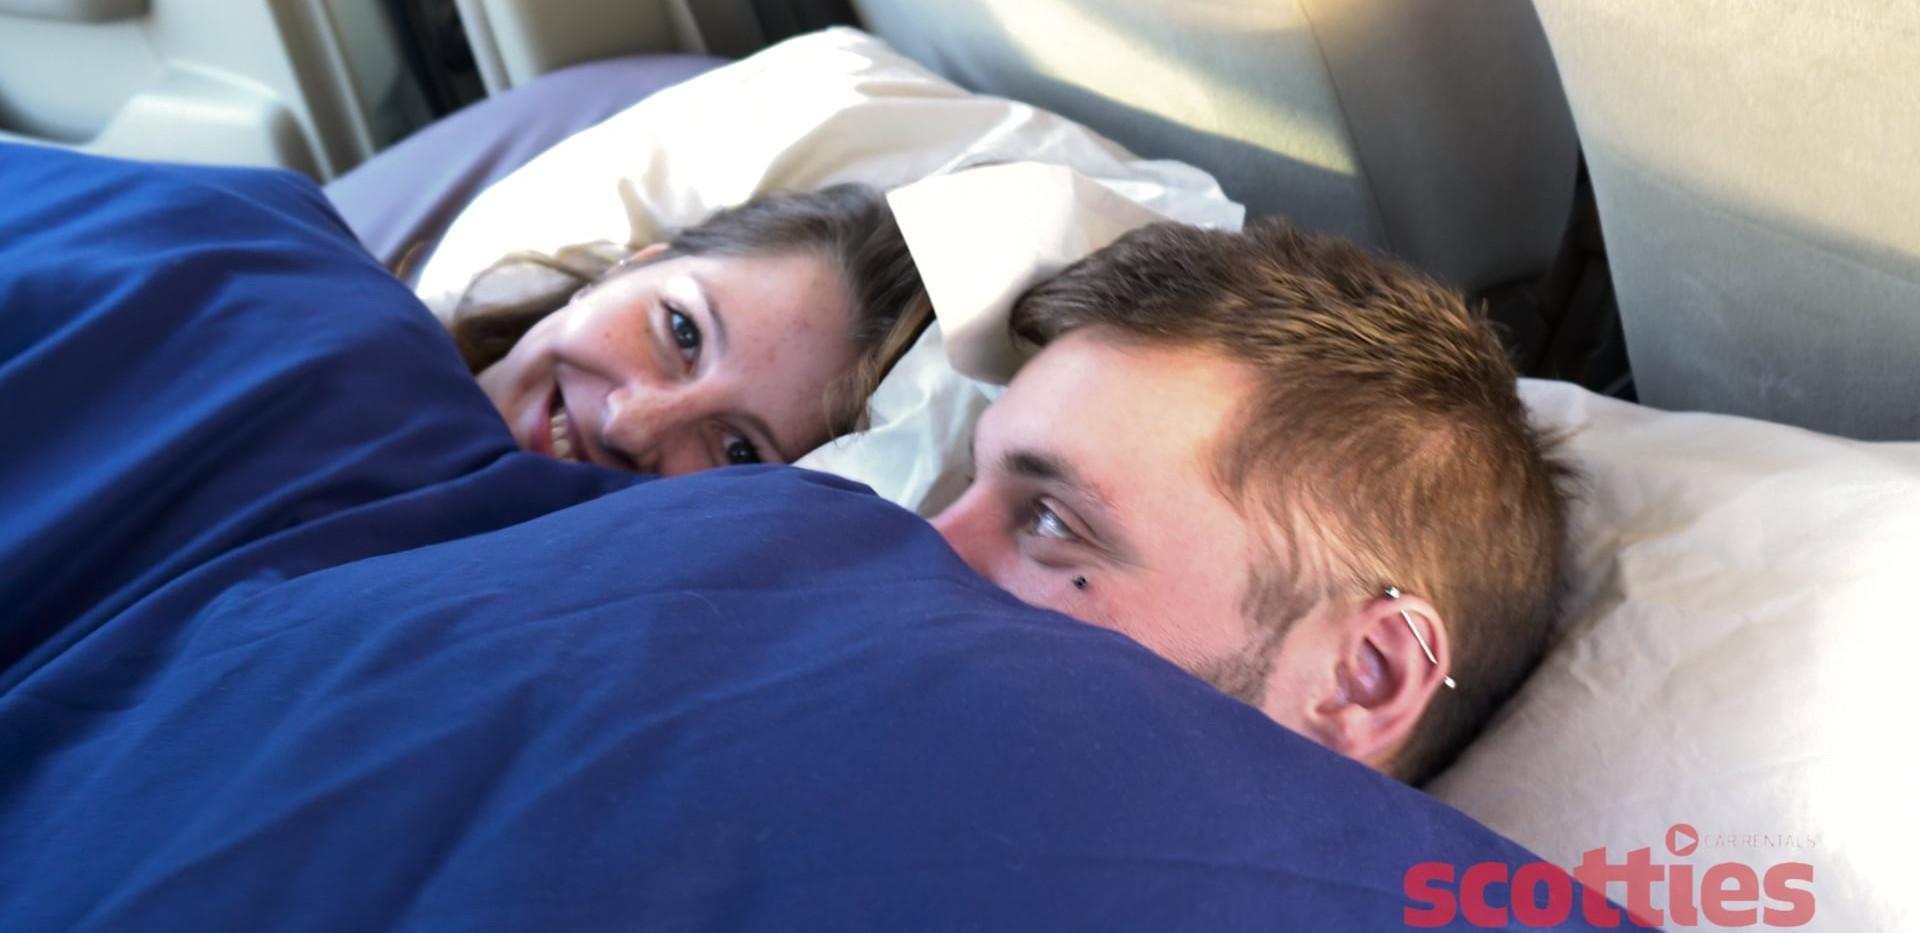 Sleep time in the camper car